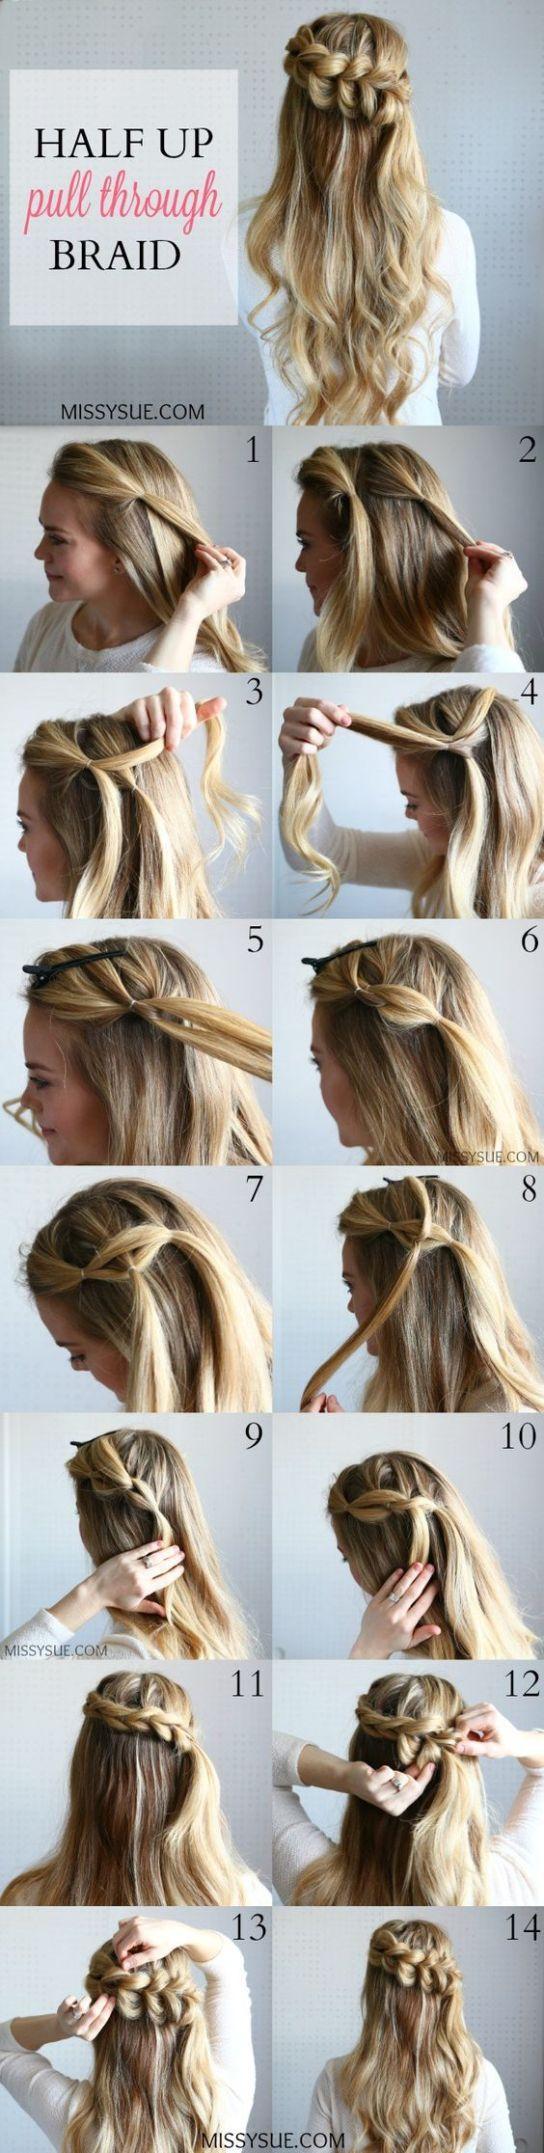 20 Gorgeous Hairstyles For Long Hair | Hair | Hair Styles, Long Hair